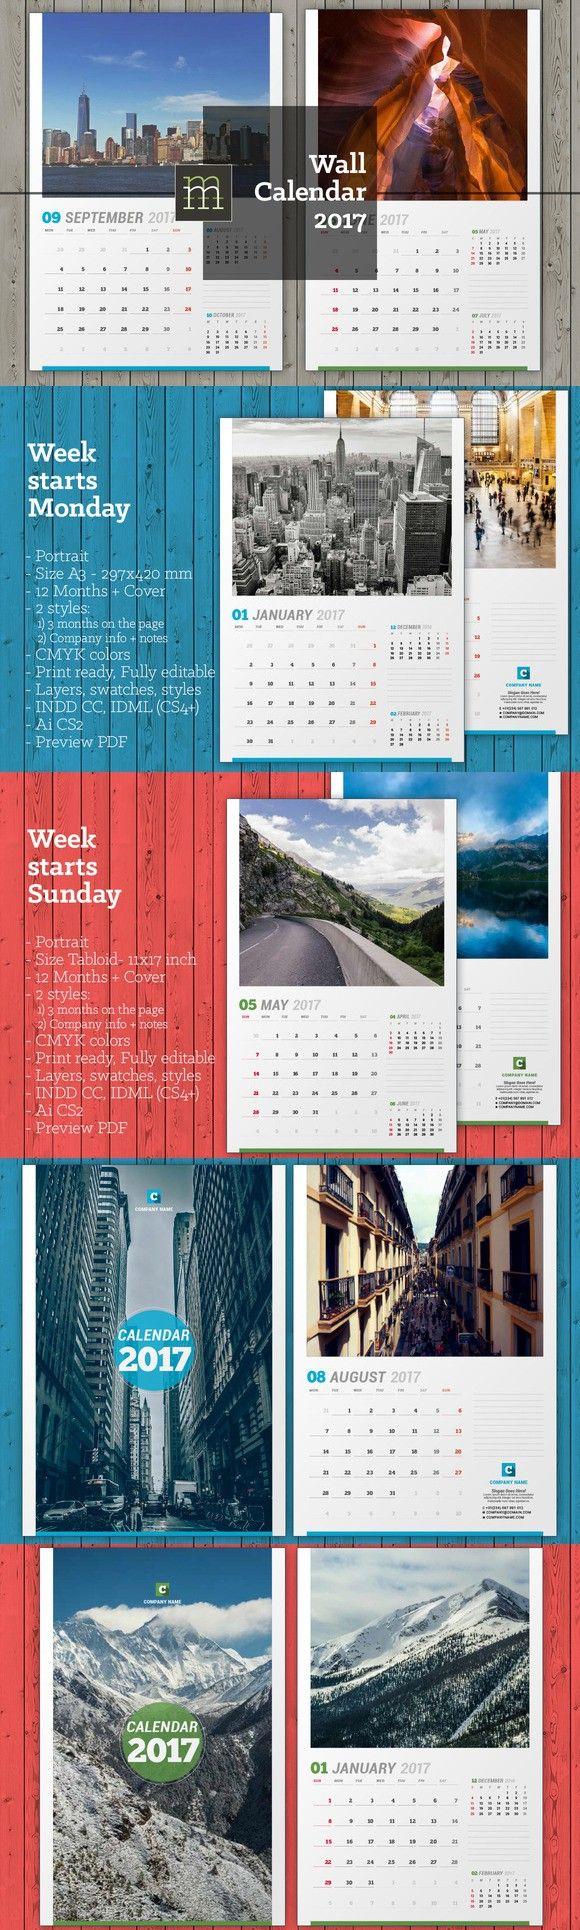 Wall Calendar 2017 (WC15). Stationery Templates. $9.00